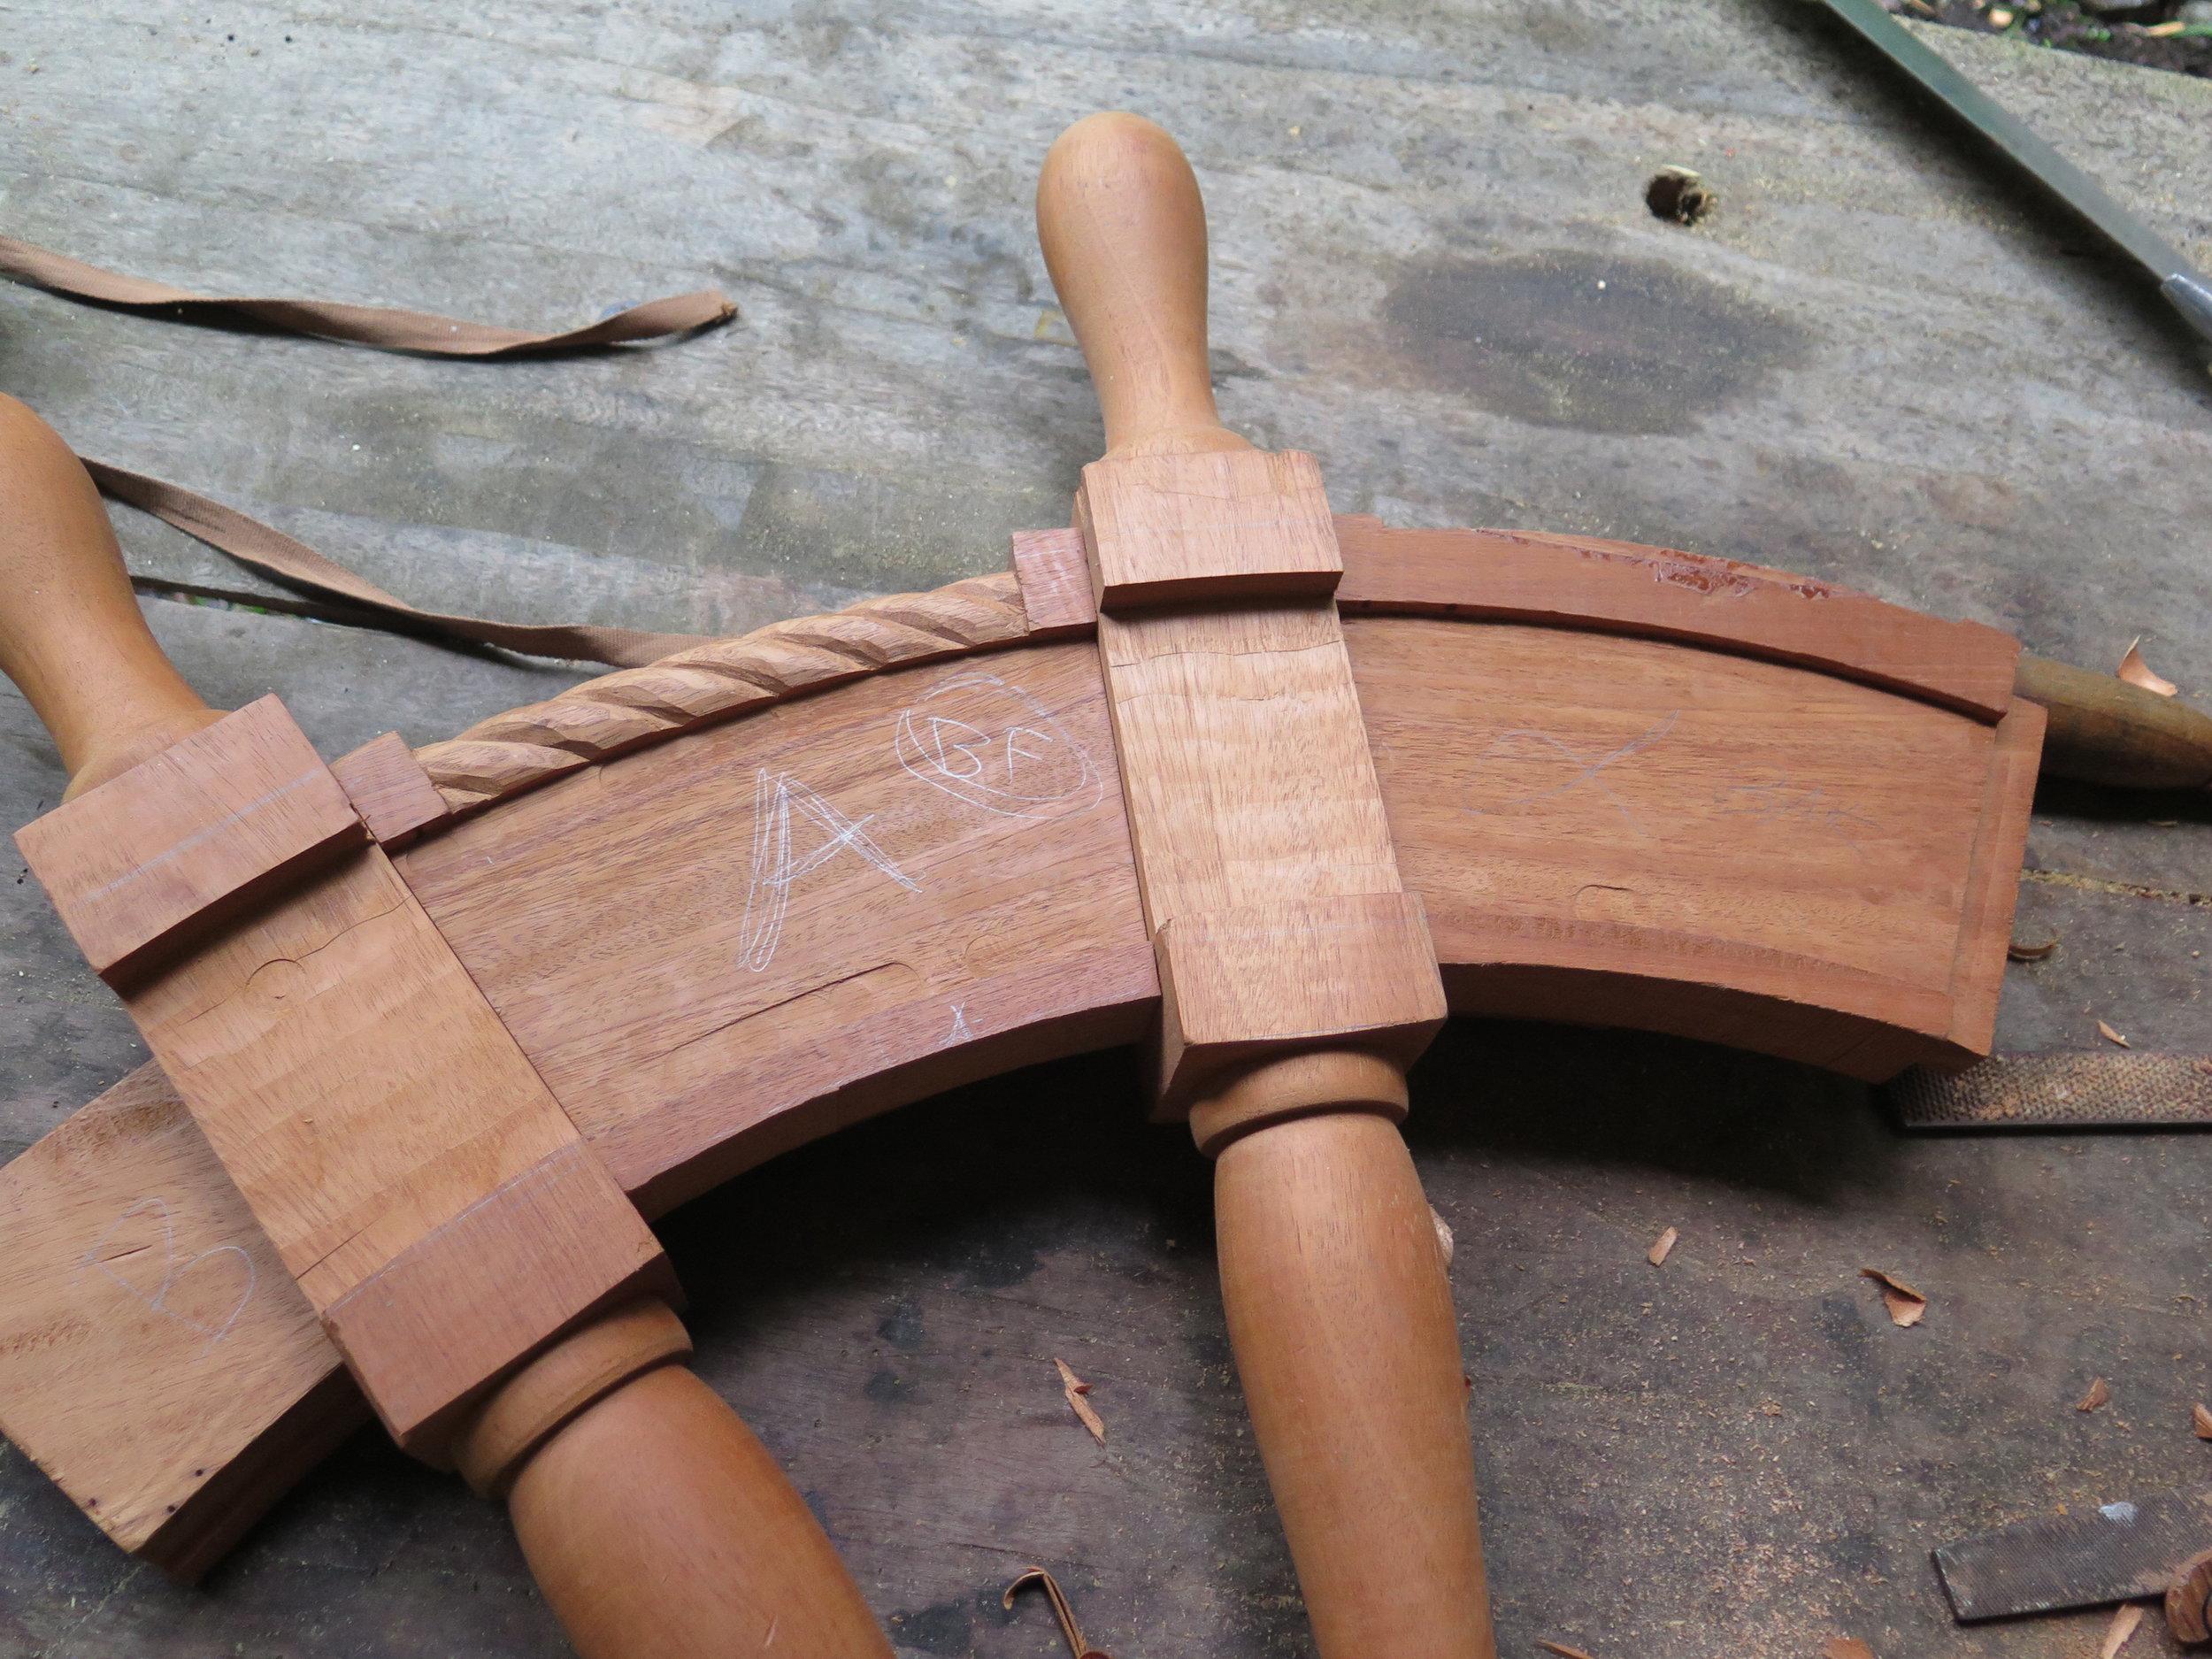 Fine Woodwork  To be headed by Lynx Guimond, fine woodwork artist; carpenter and figure-head carver. www.lynxguimond.com